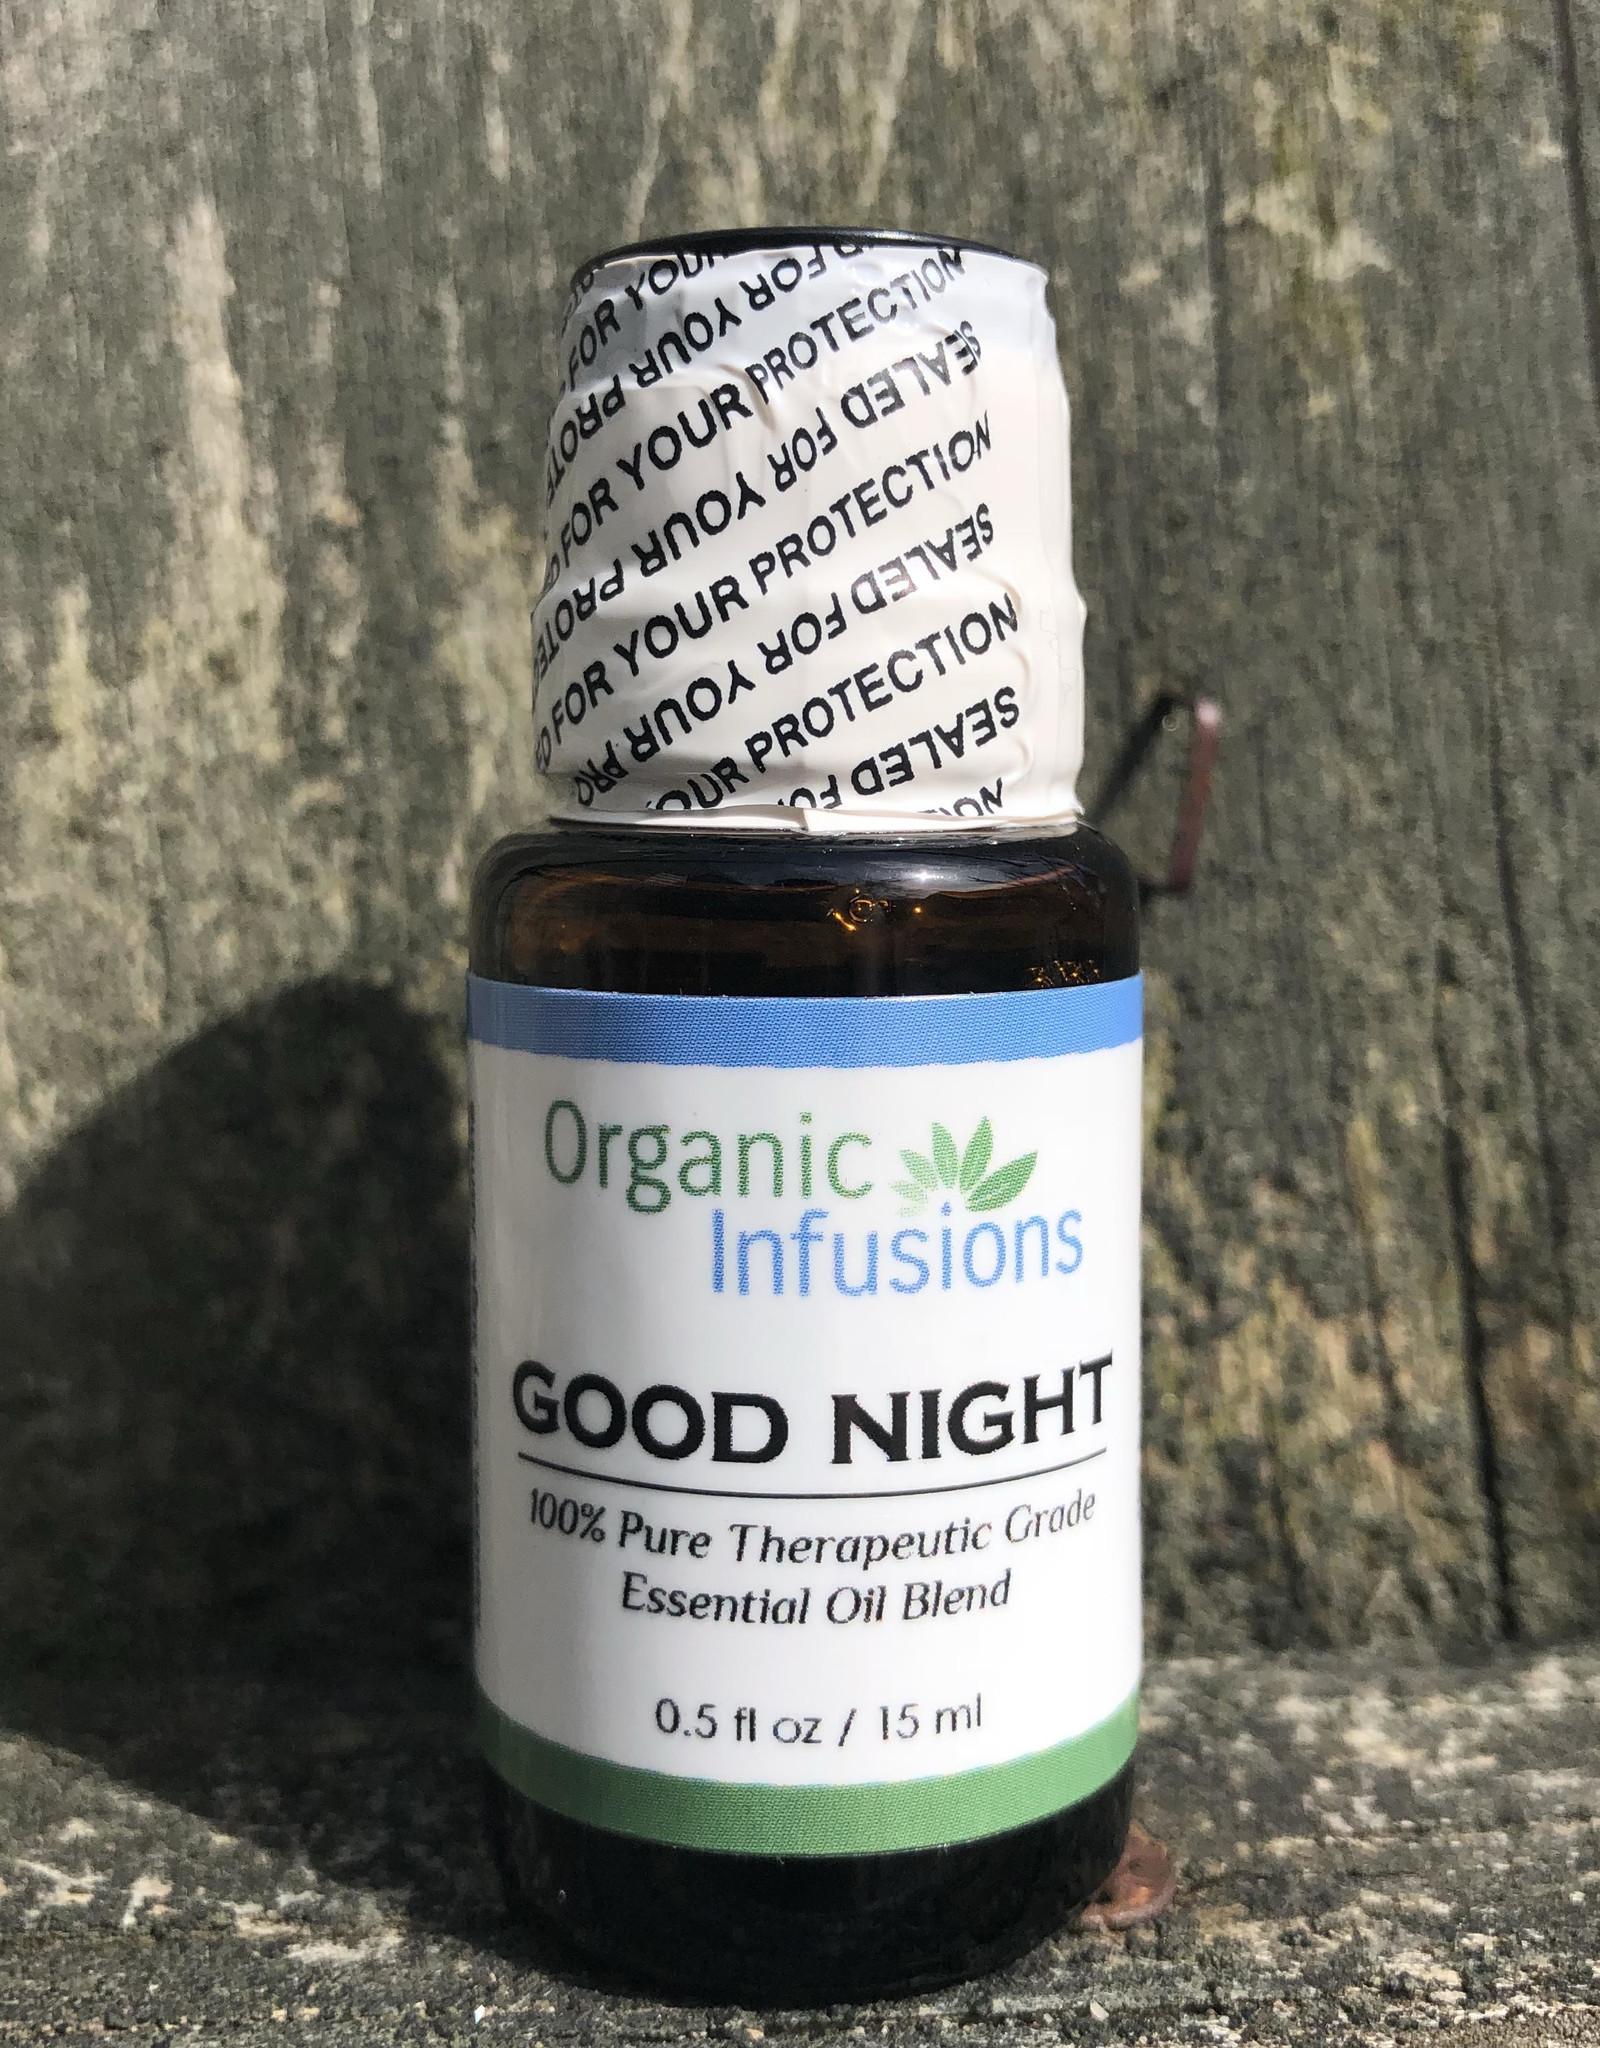 Organic Infusions Good Night